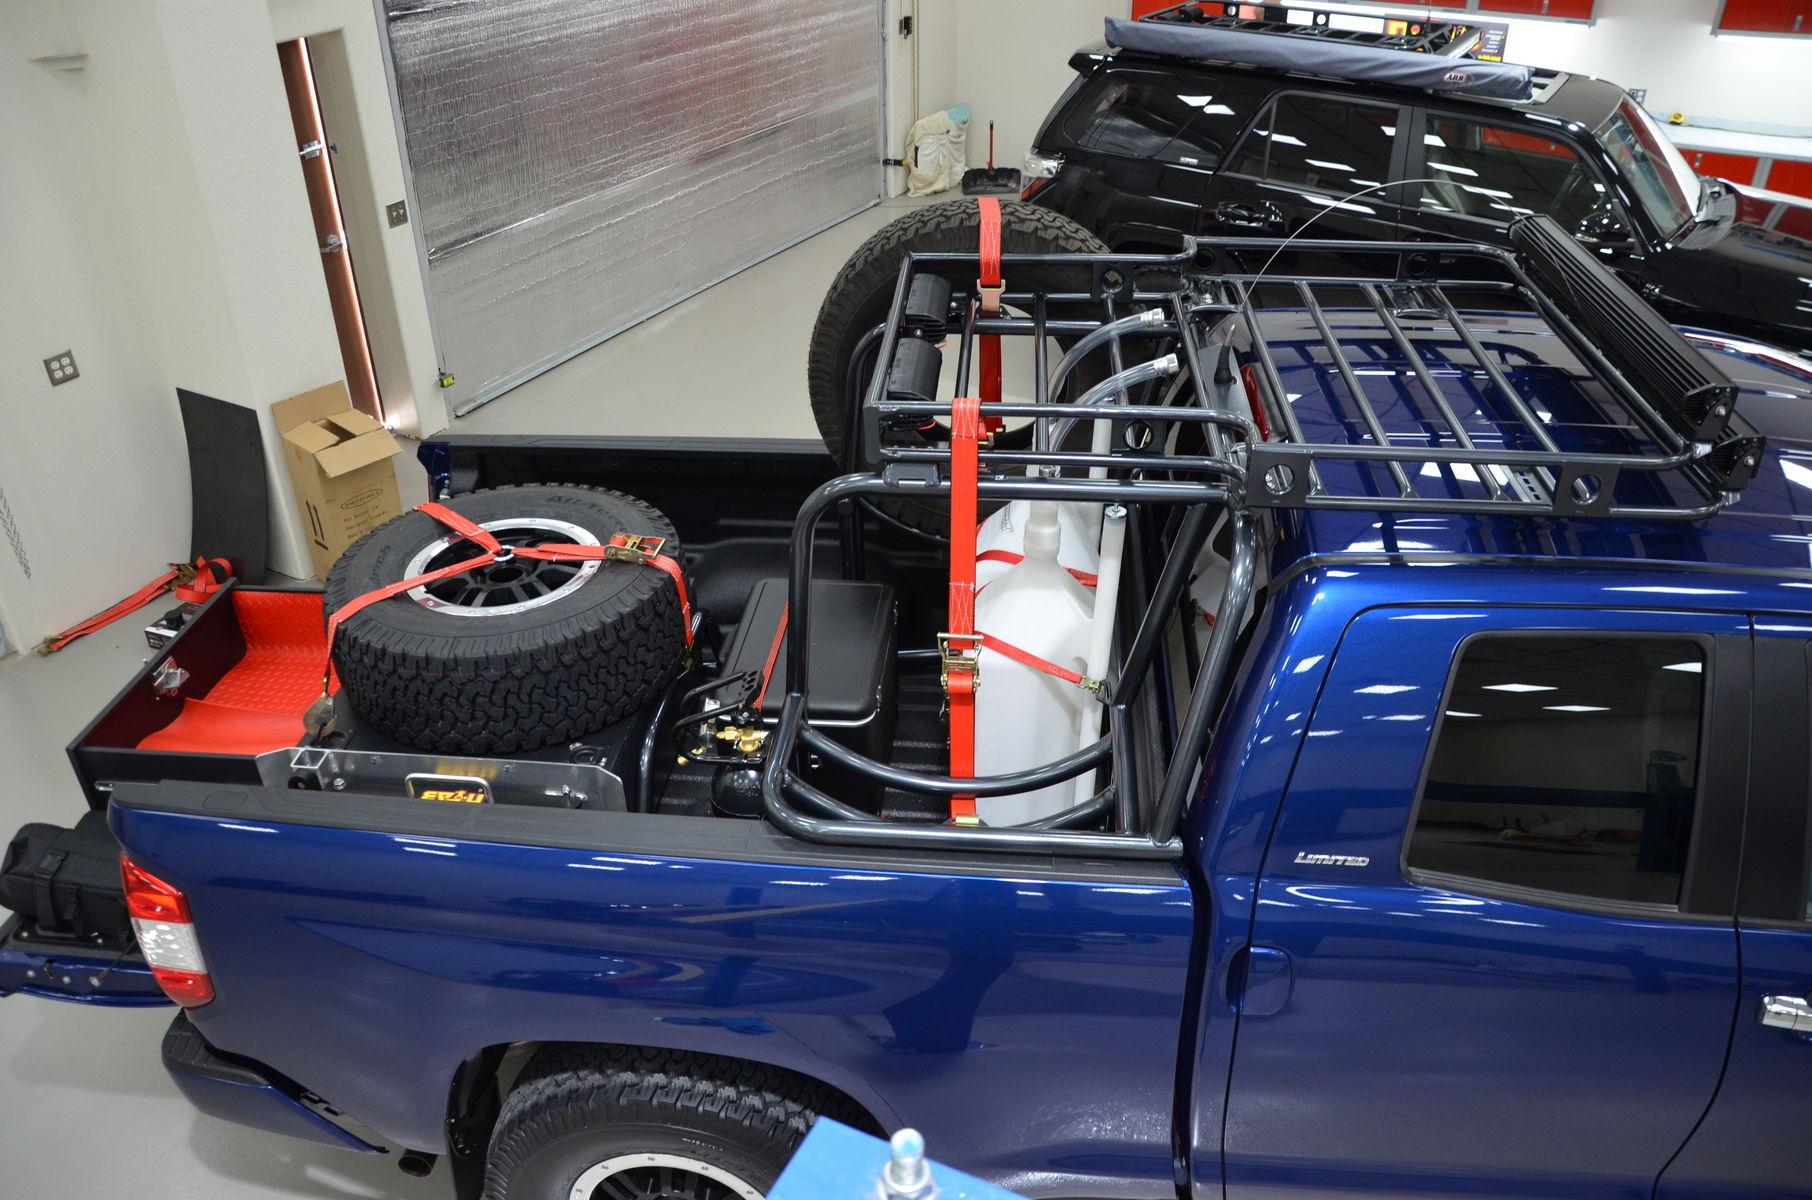 2014 Toyota Tundra | N-FAB TRD PRO Build - Toyota Tundra Cargo Shot